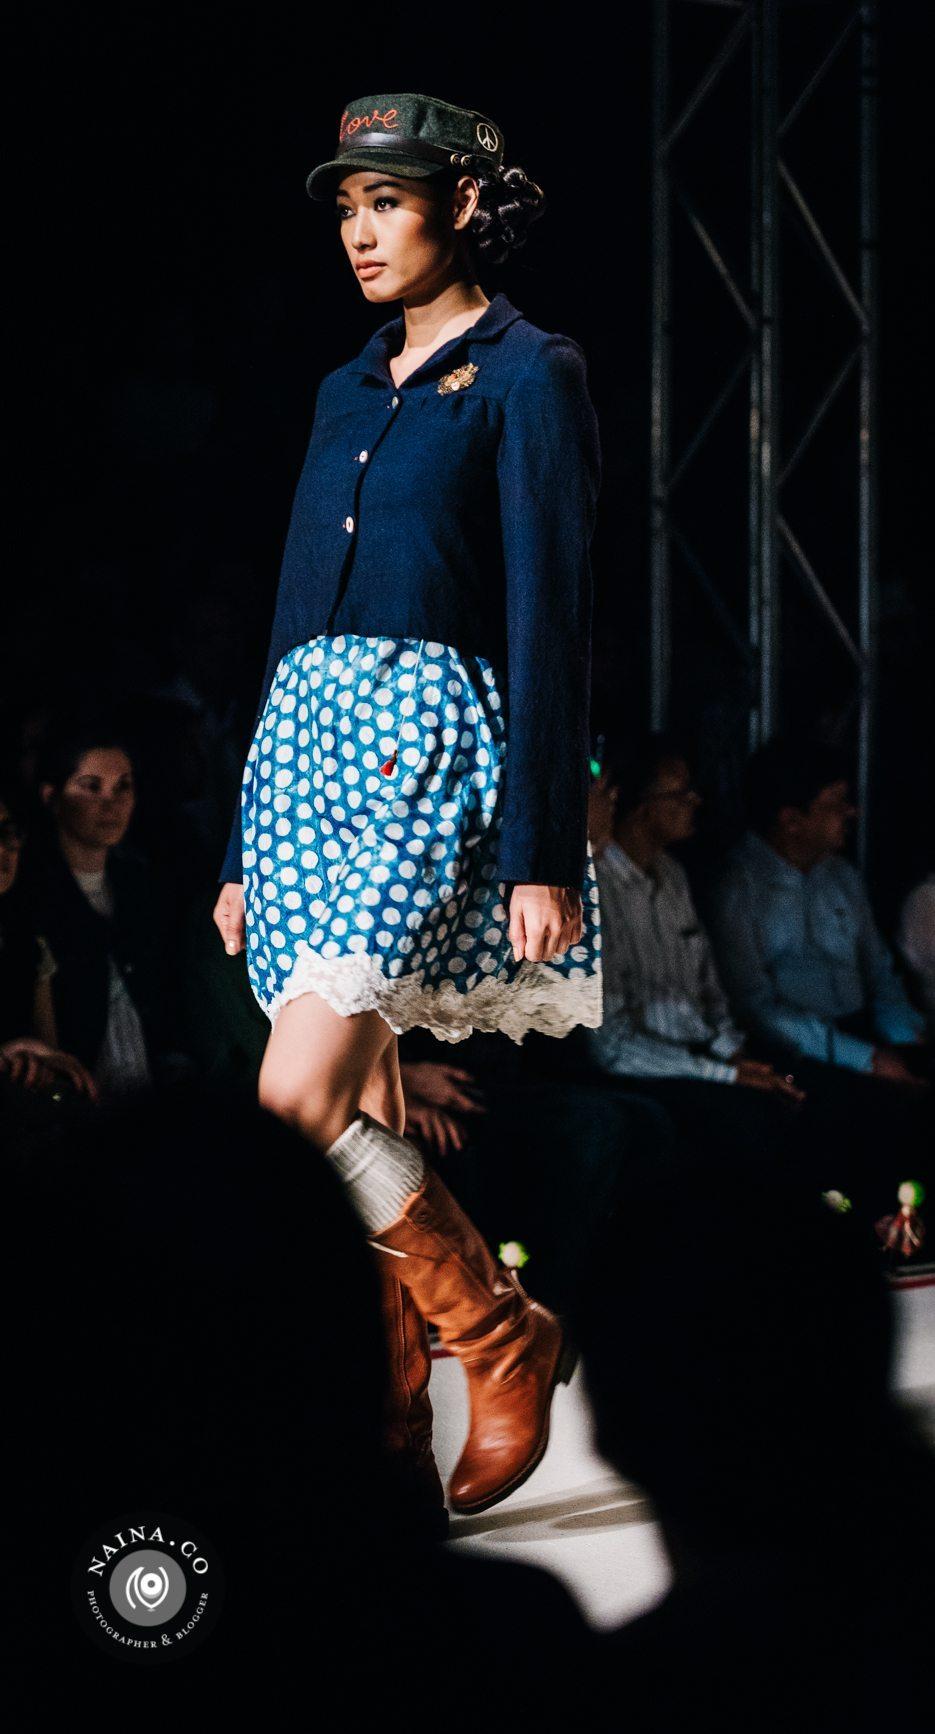 Naina.co-Raconteuse-Visuelle-Photographer-Blogger-Storyteller-Luxury-Lifestyle-AIFWAW15-Pero-22